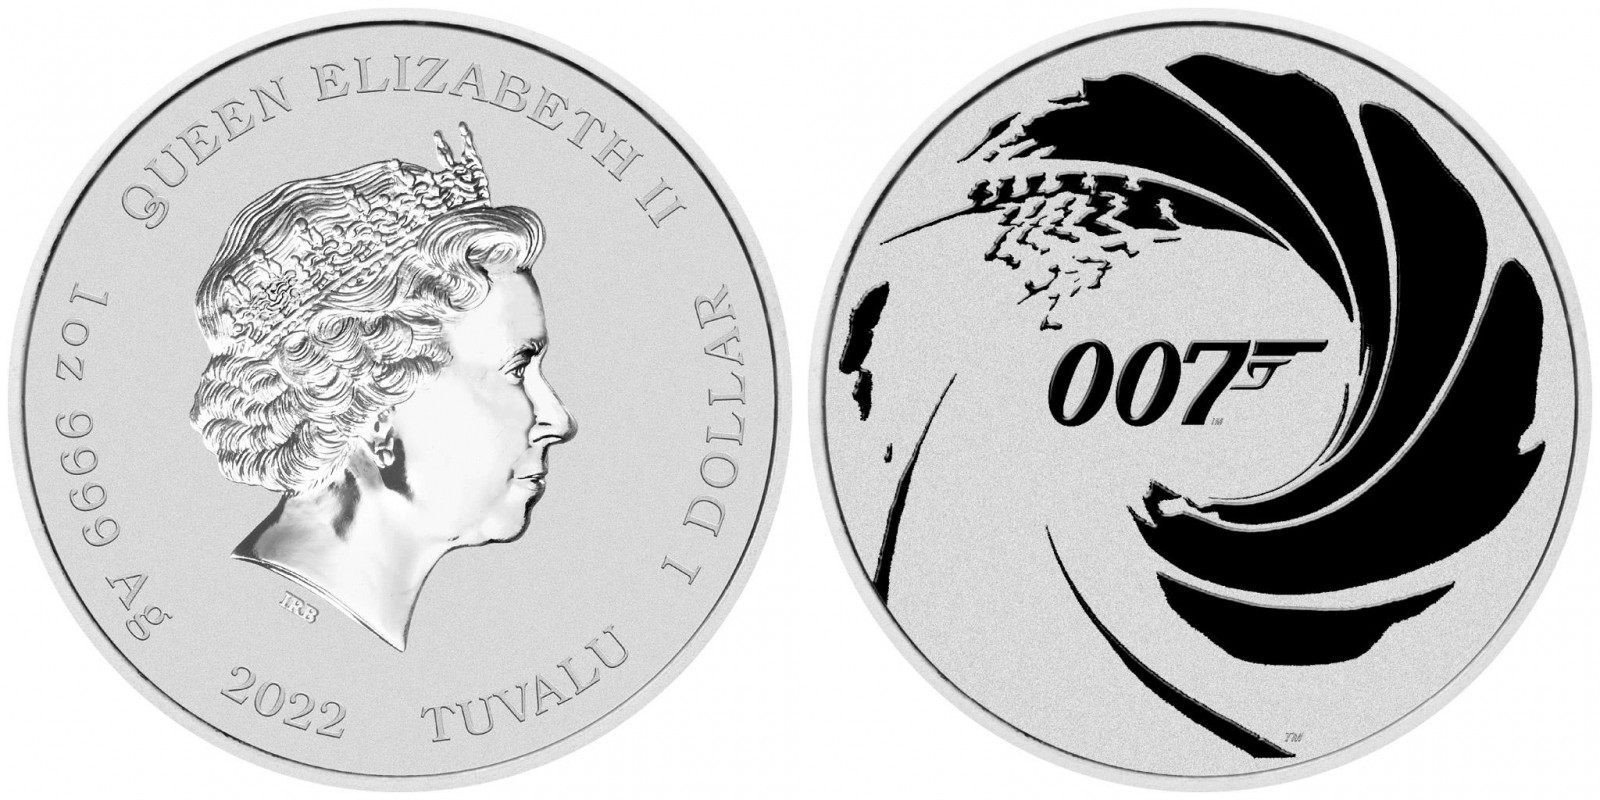 tuvalu-2022-james-bond-007-black-edition